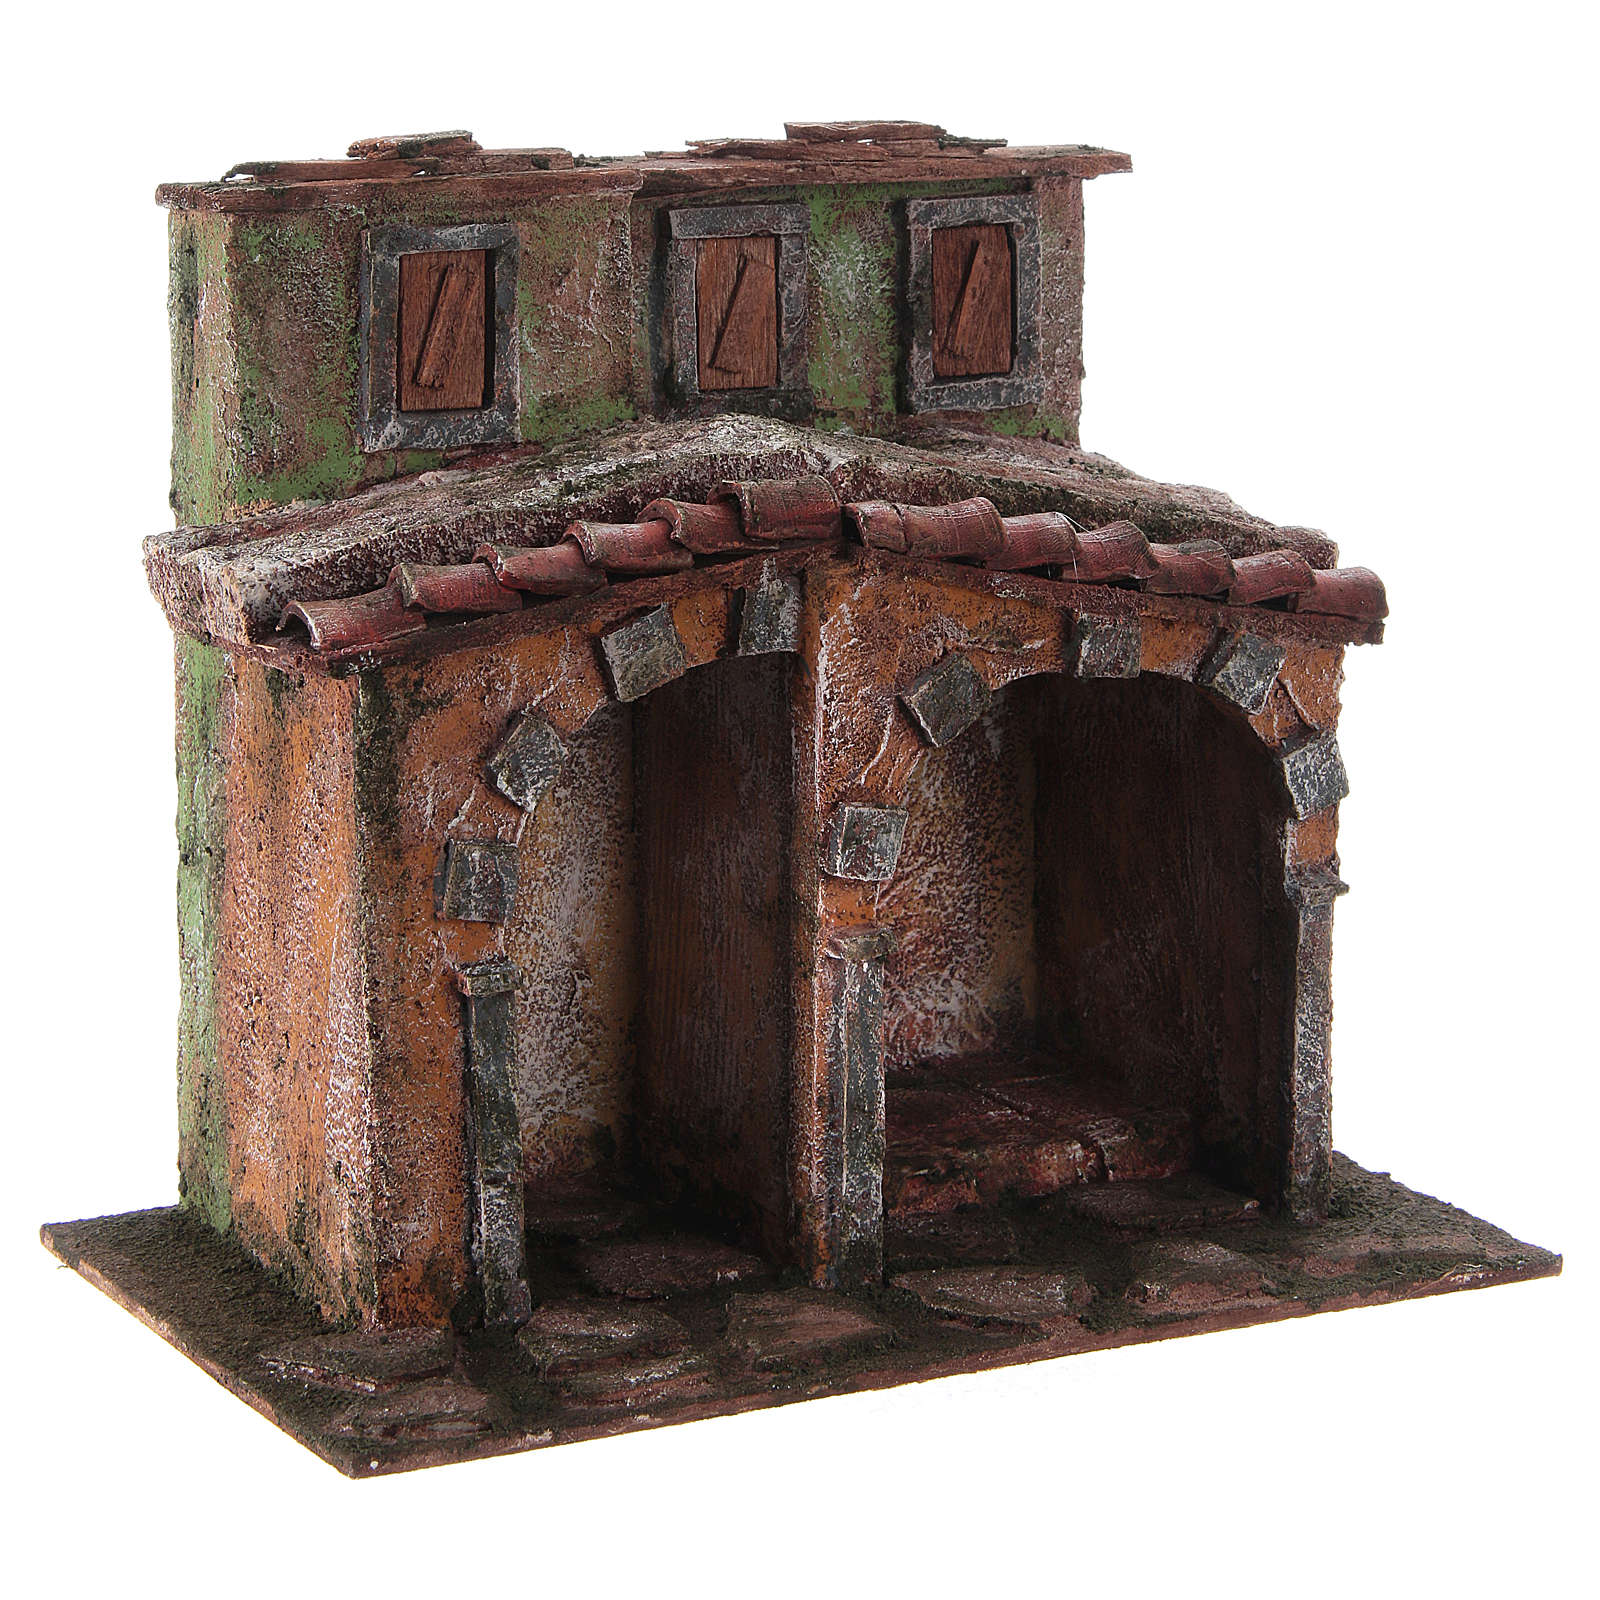 Casetta con capanna rustica presepe 10 cm 20x25x15 4